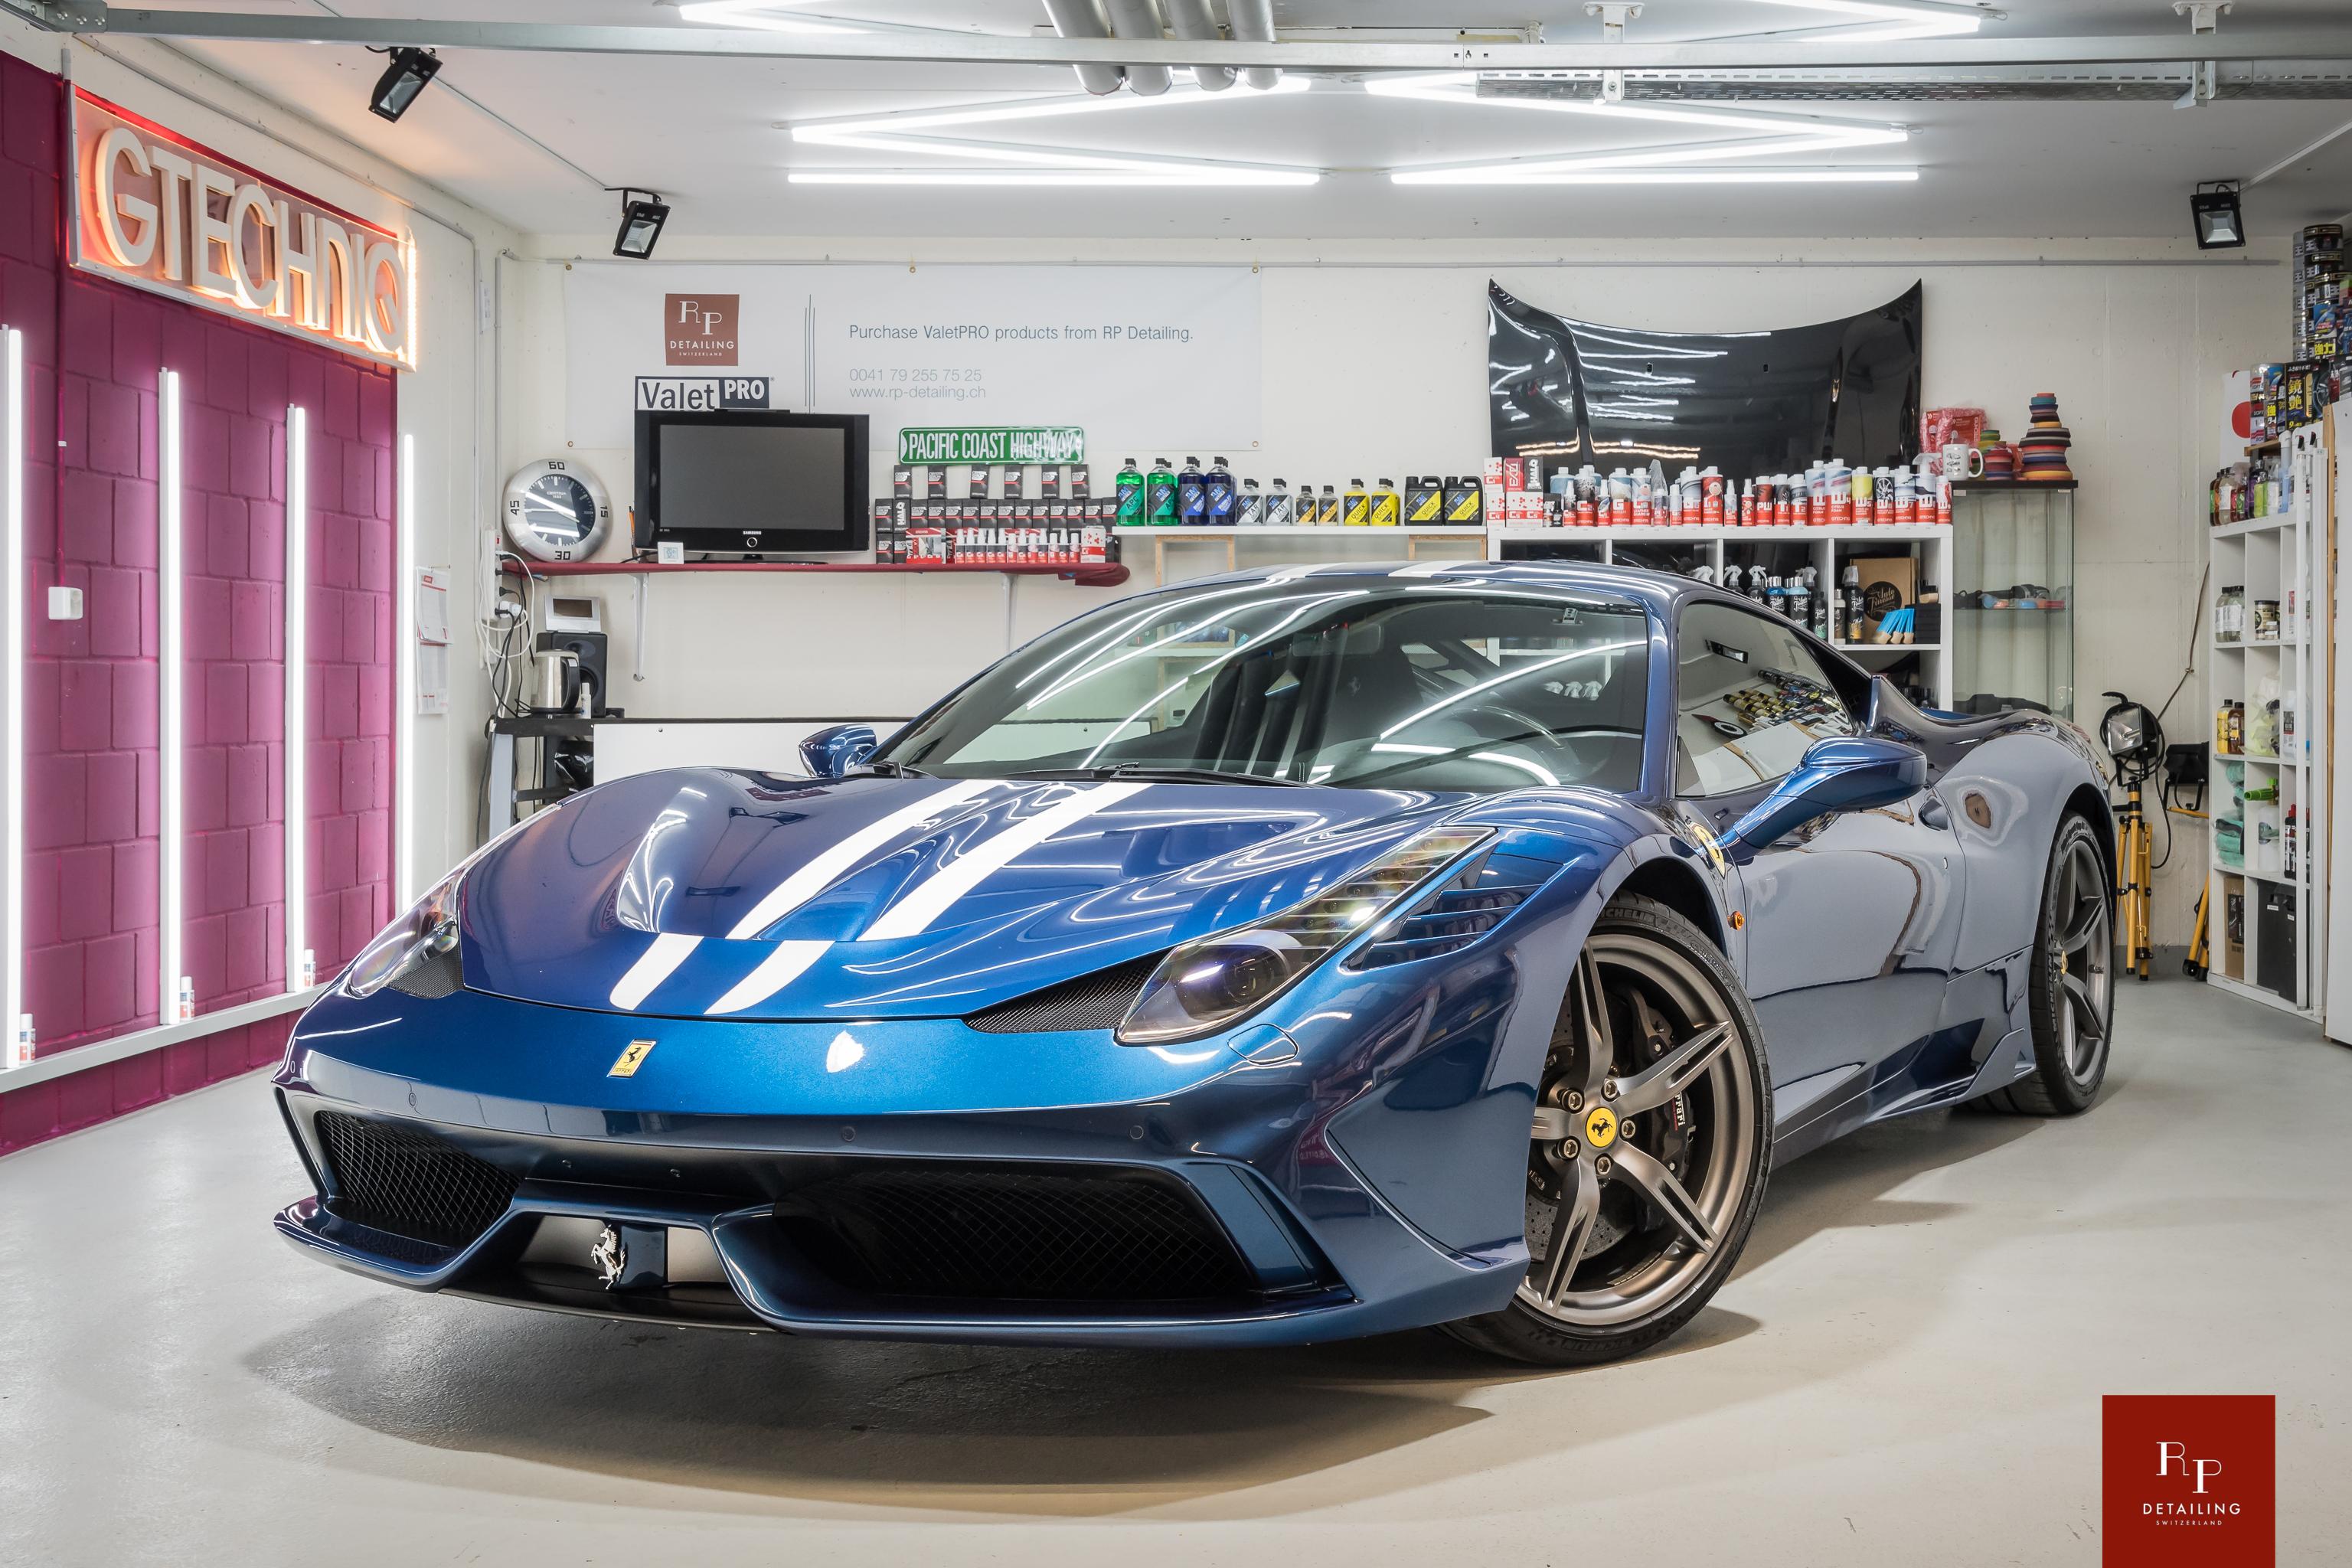 Ferrari%20Speciale%20RP%2018.jpg